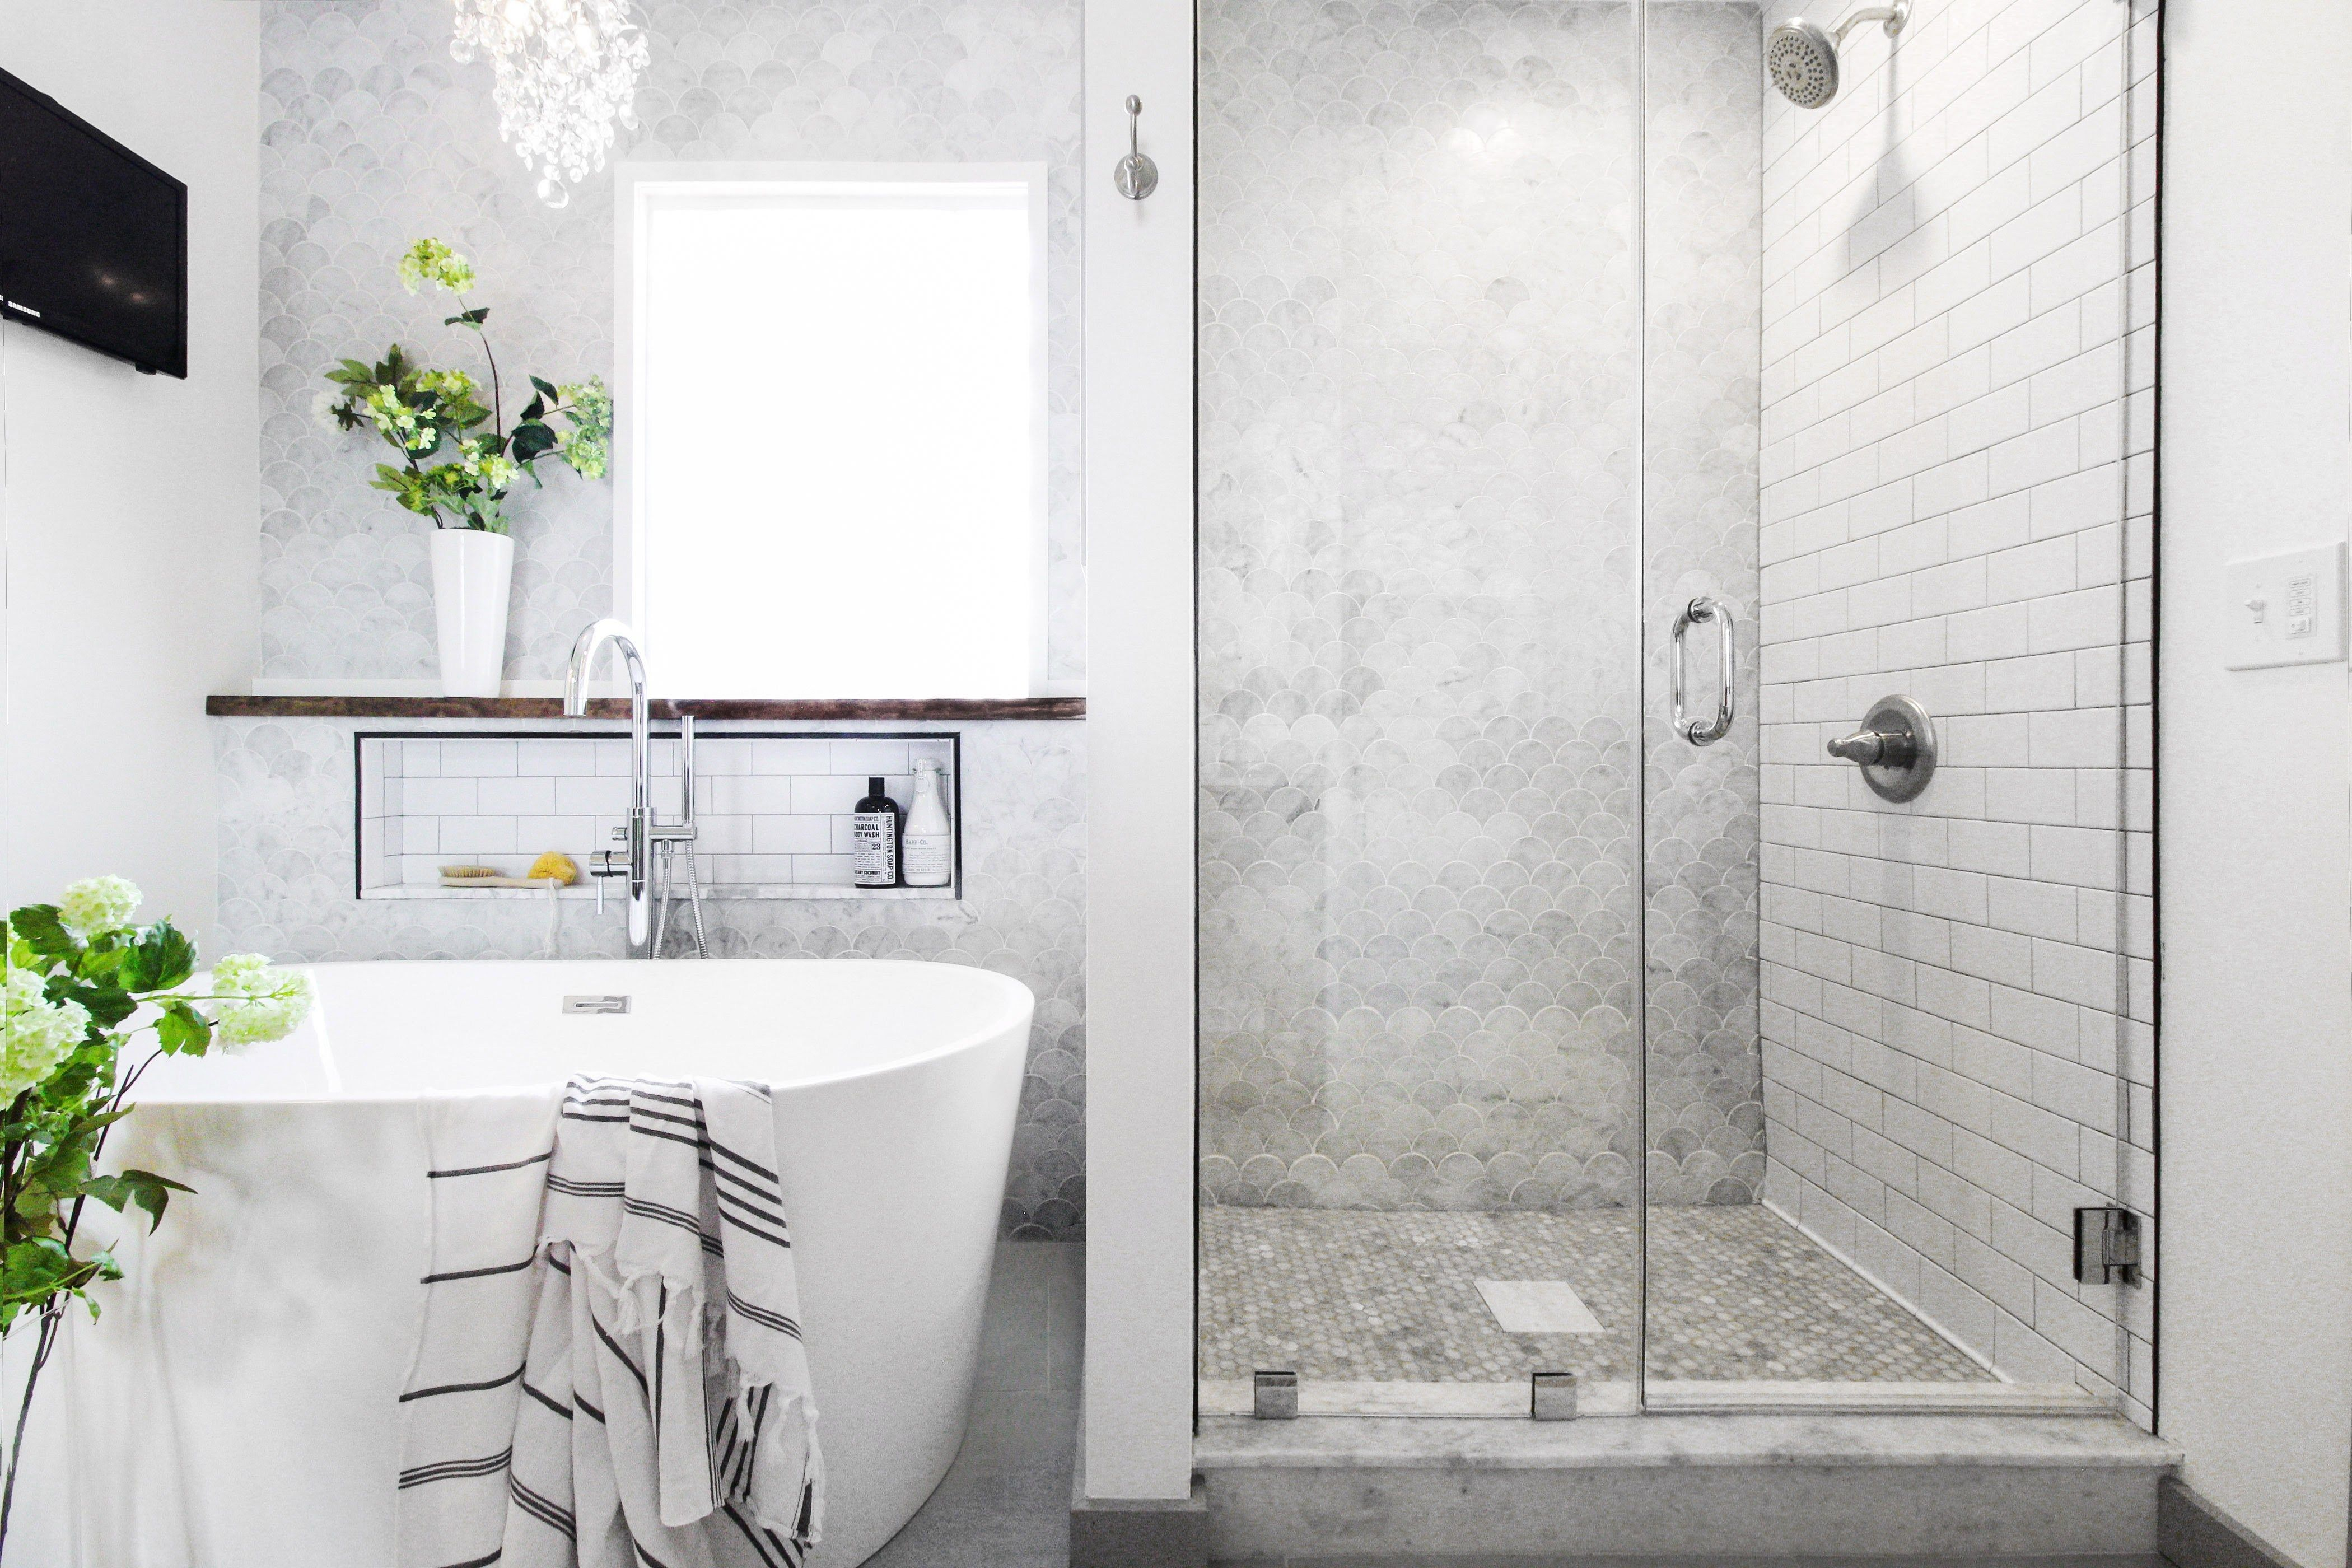 Before & After JW Bathroom Remodel